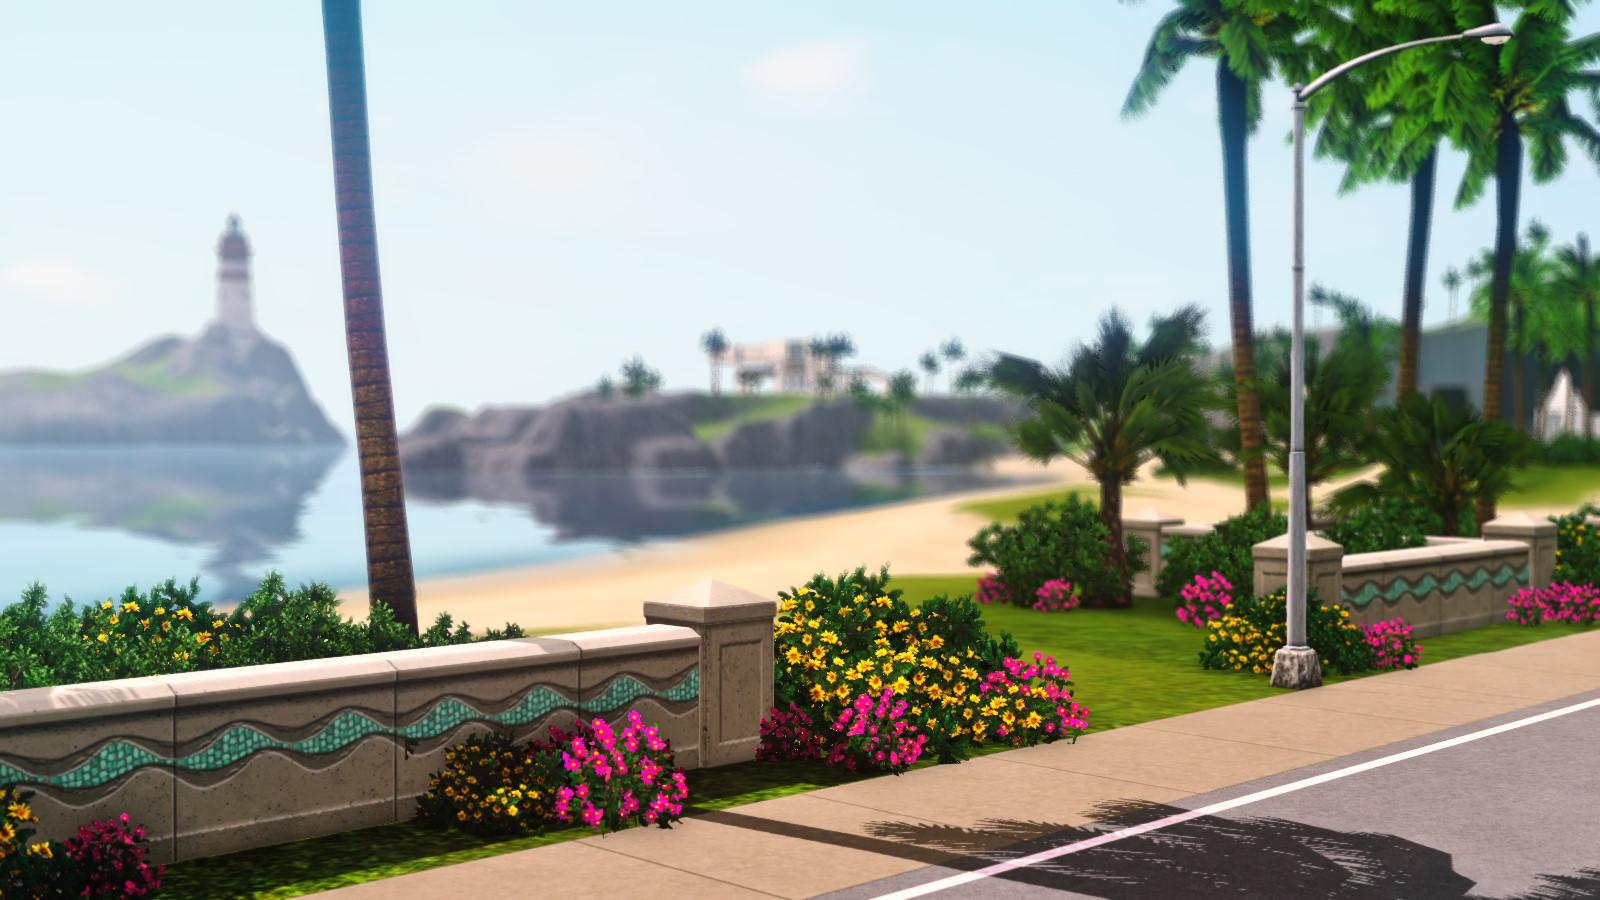 Mod The Sims - Ayumu Reshade Preset v1 1